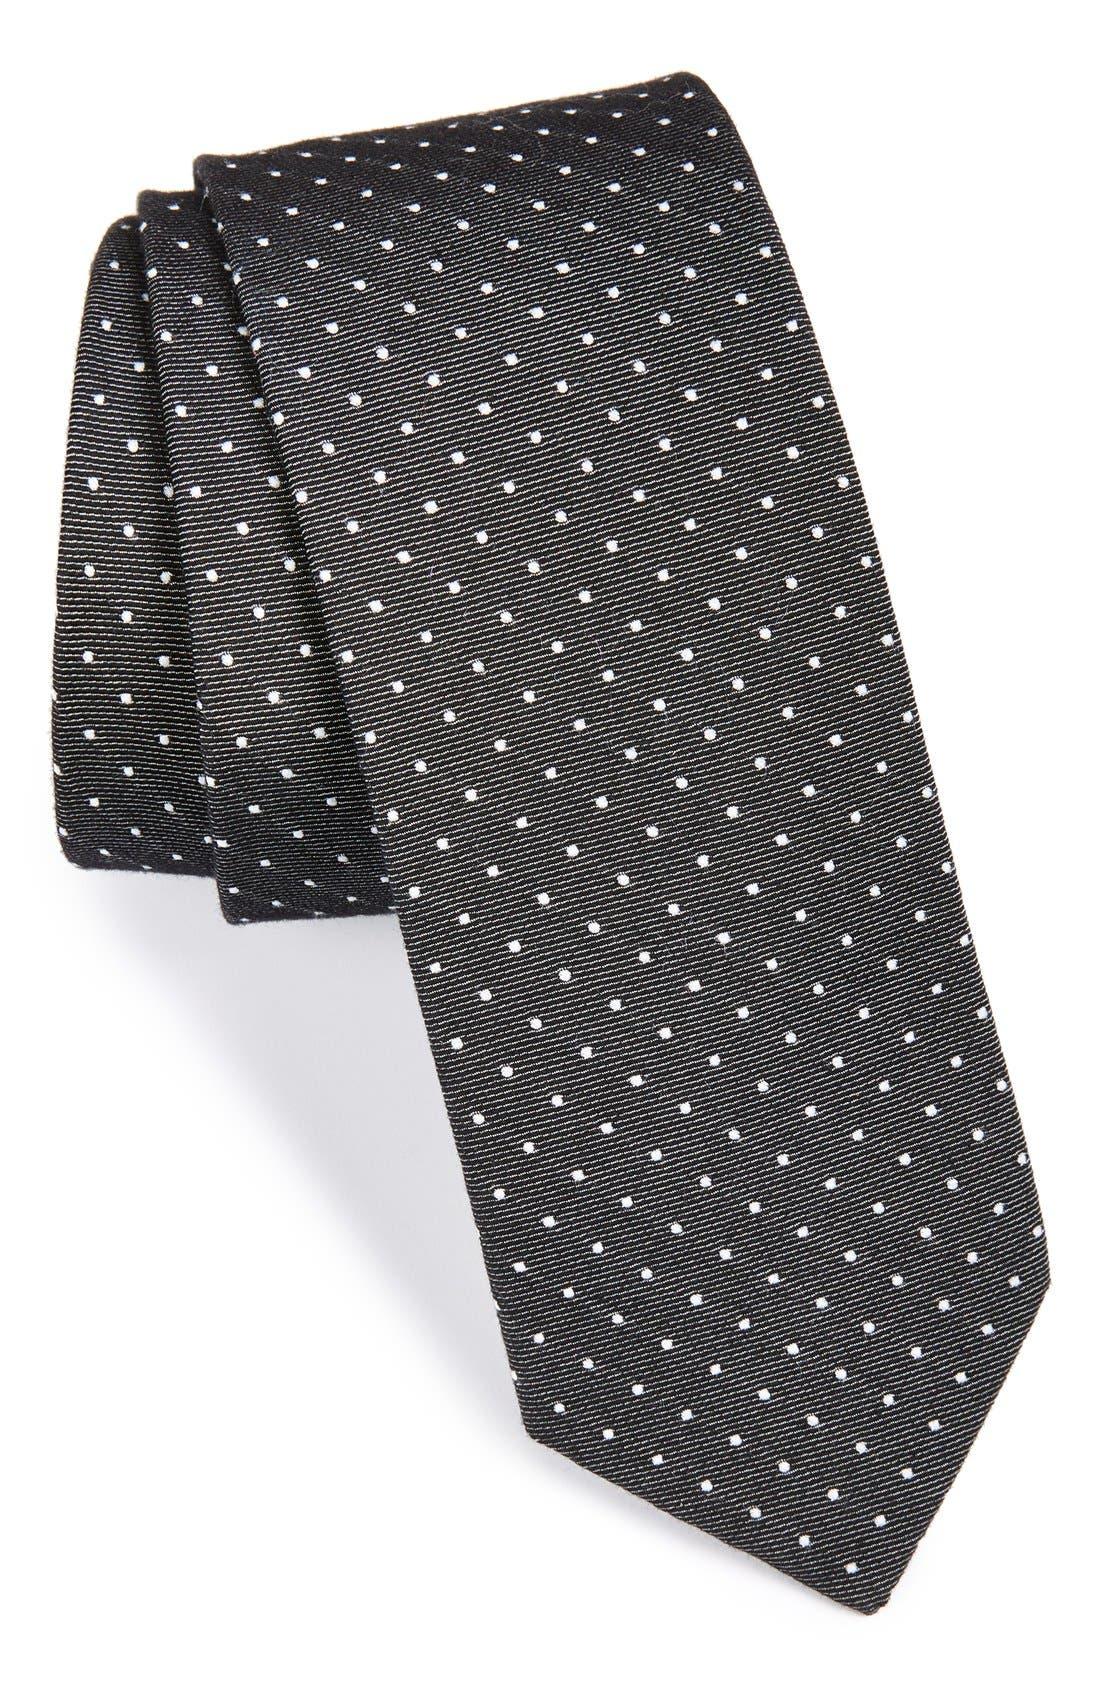 Alternate Image 1 Selected - 1901 'EB' Silk & Cotton Dot Tie